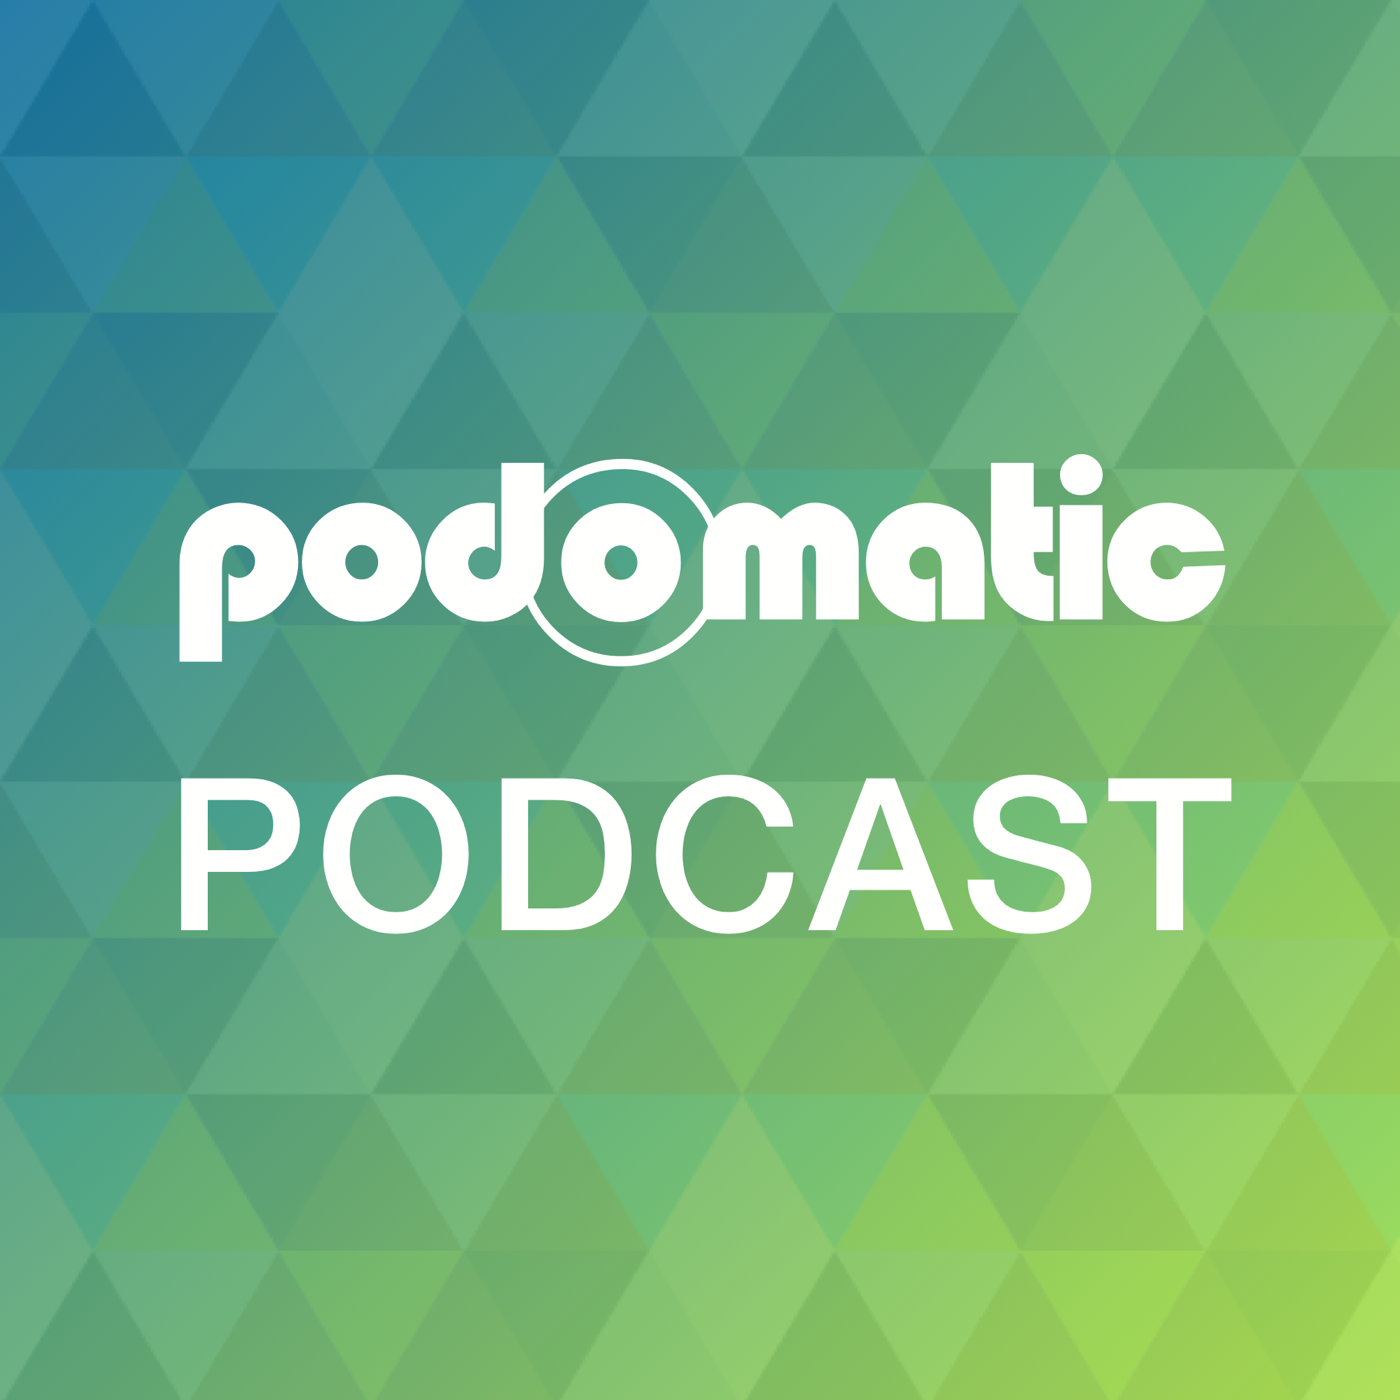 LilD's Podcast